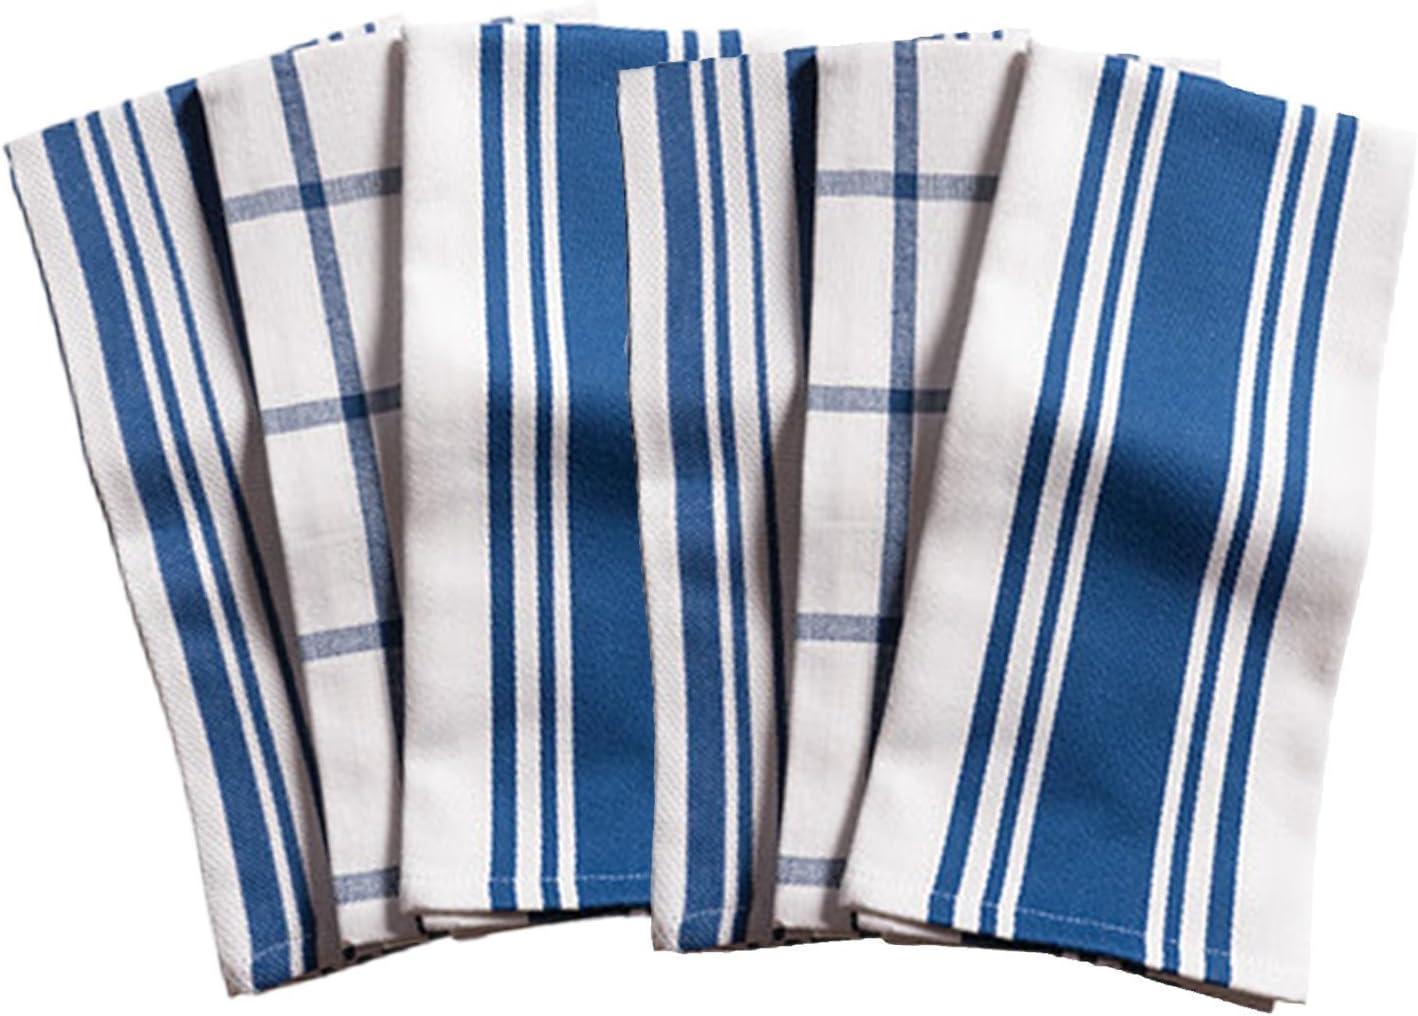 Amazon Com Kaf Home Kitchen Towels Set Of 6 Blue White 100 Cotton Machine Washable Ultra Absorbent Home Kitchen